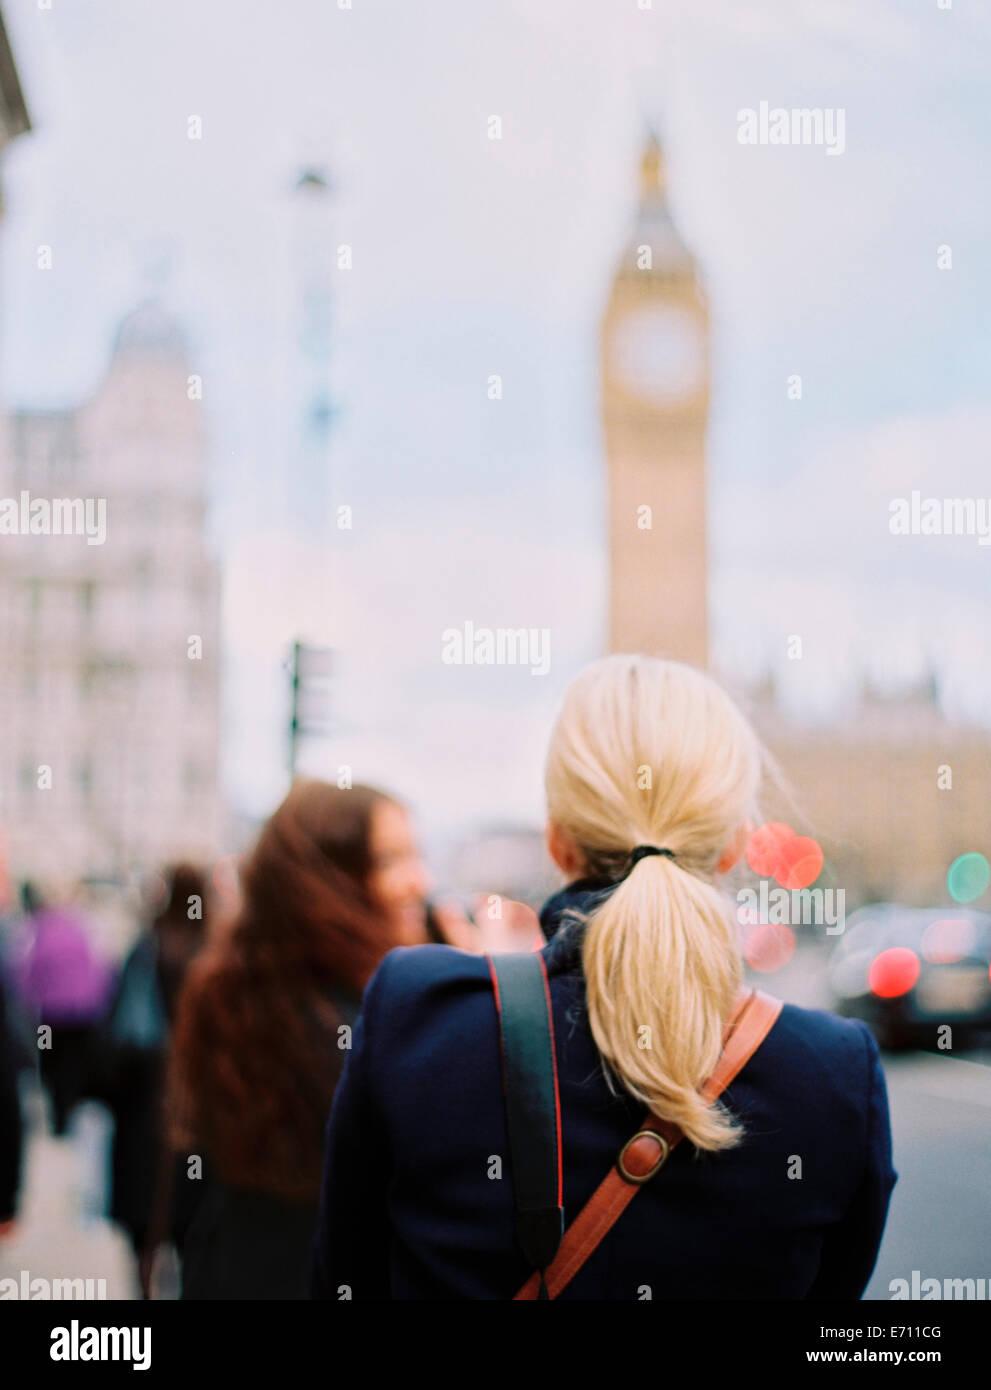 Two women in London on the street near Big Ben, The Elizabeth Tower in Westminster, in London. - Stock Image